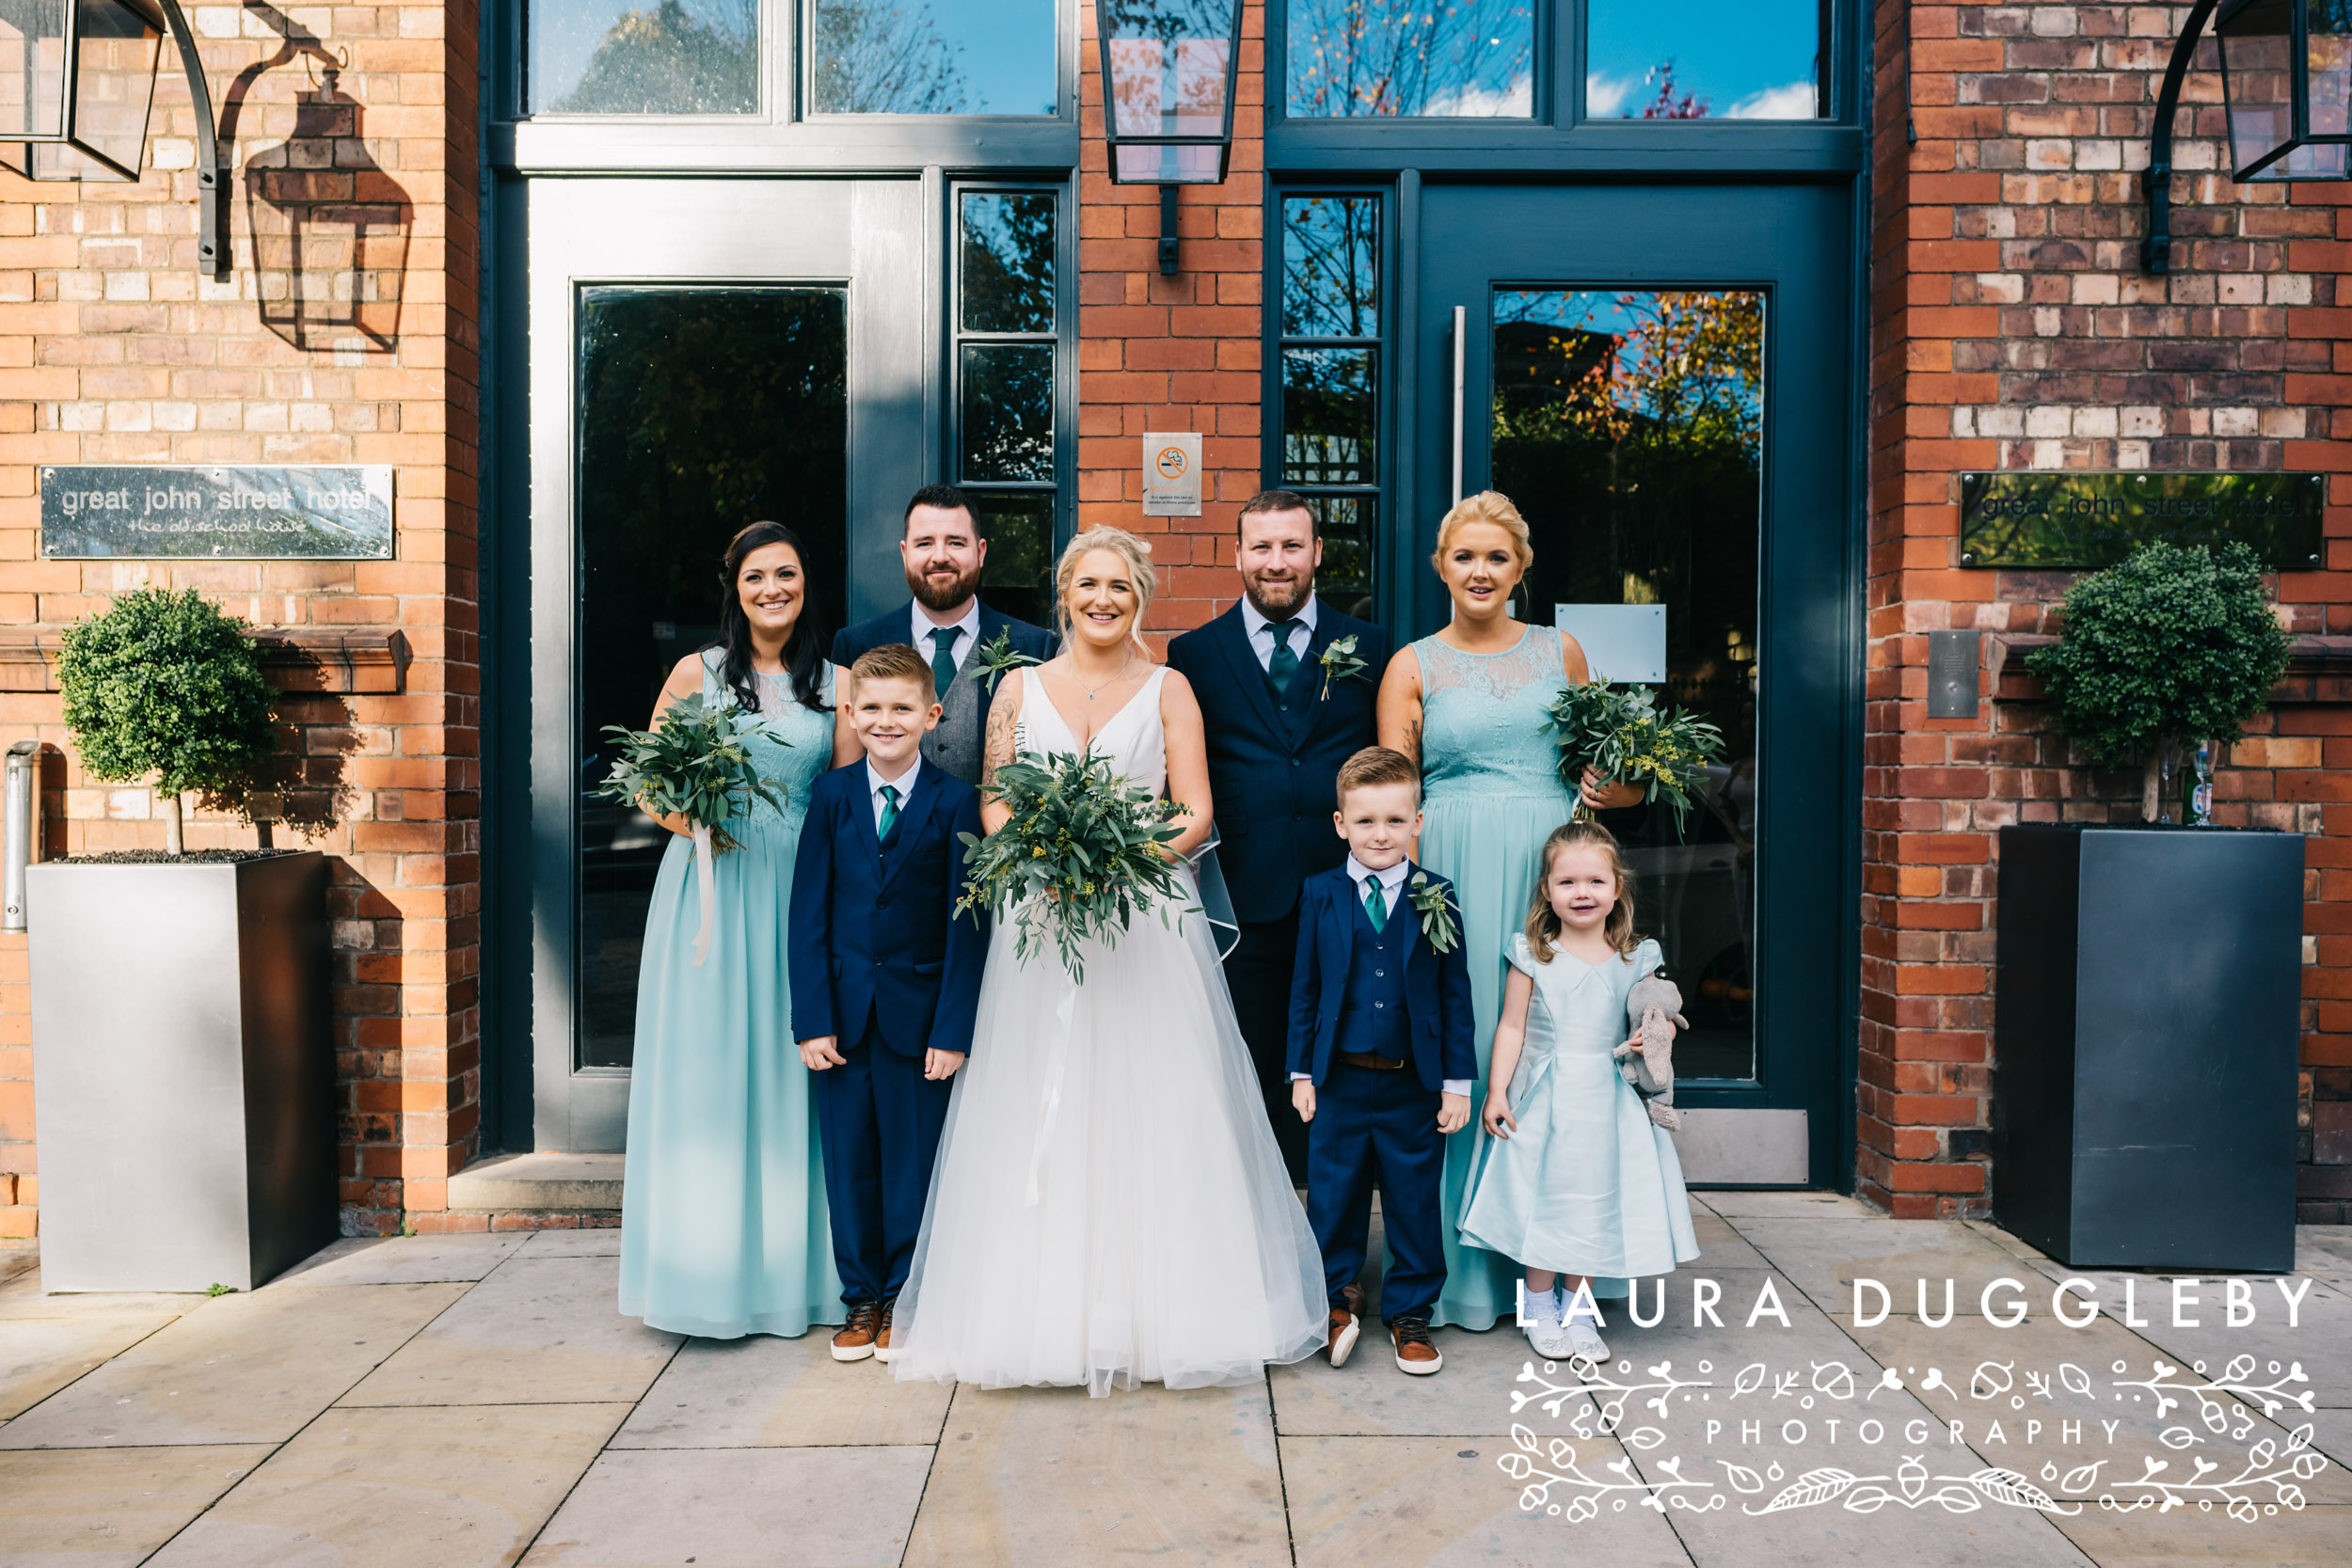 Great John Street Hotel Manchester Wedding Photographer-28.jpg